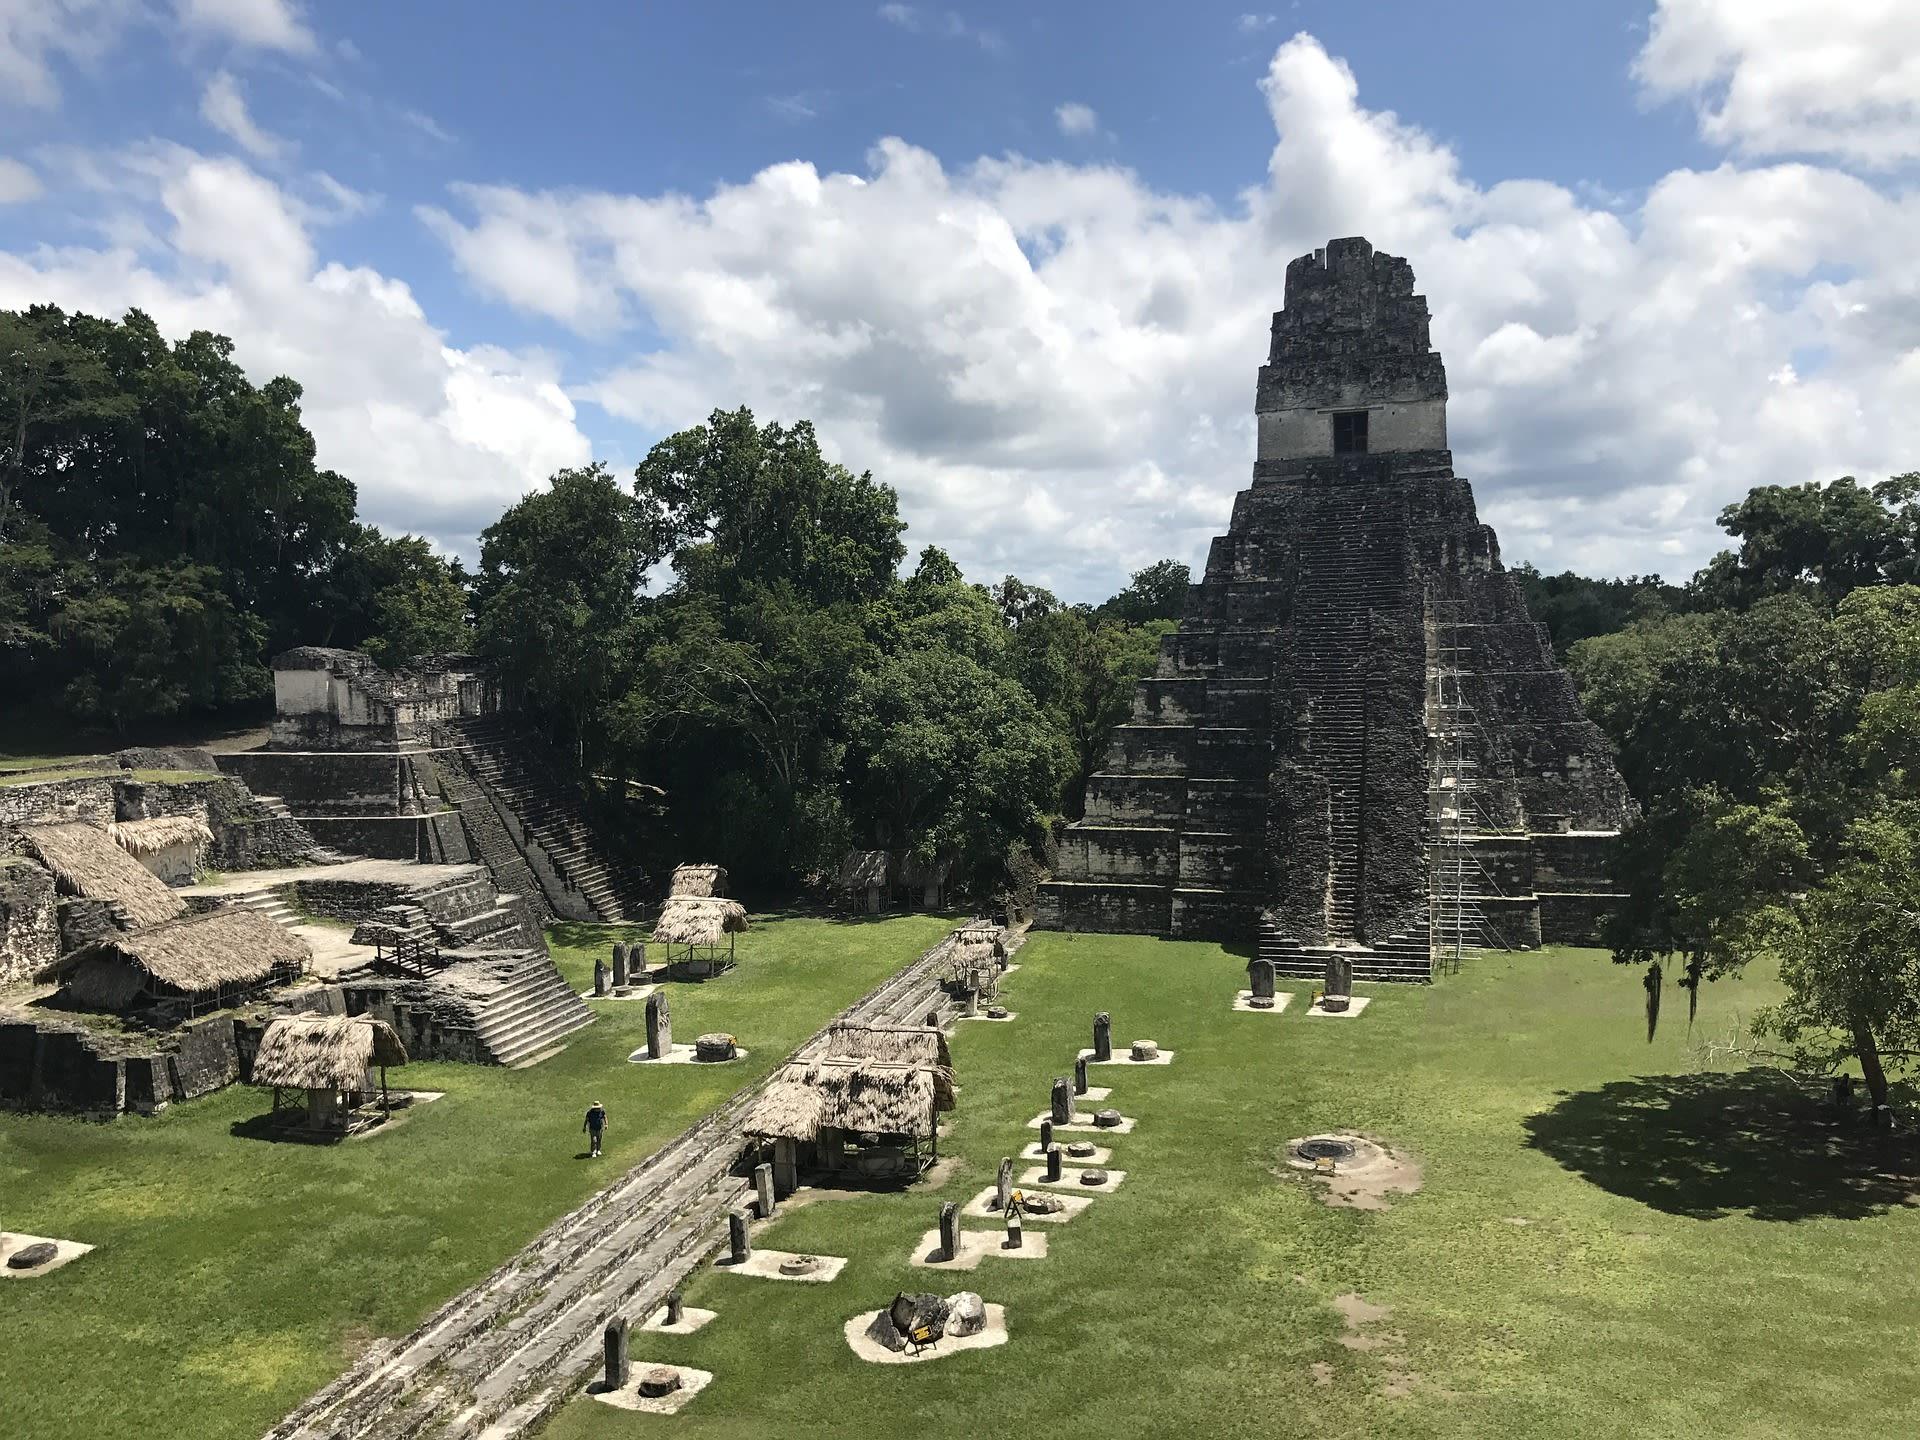 Guatemala Experience Tours 2019 - 2020 -  Tikal Mayan Ruins in Tikal Guatemala